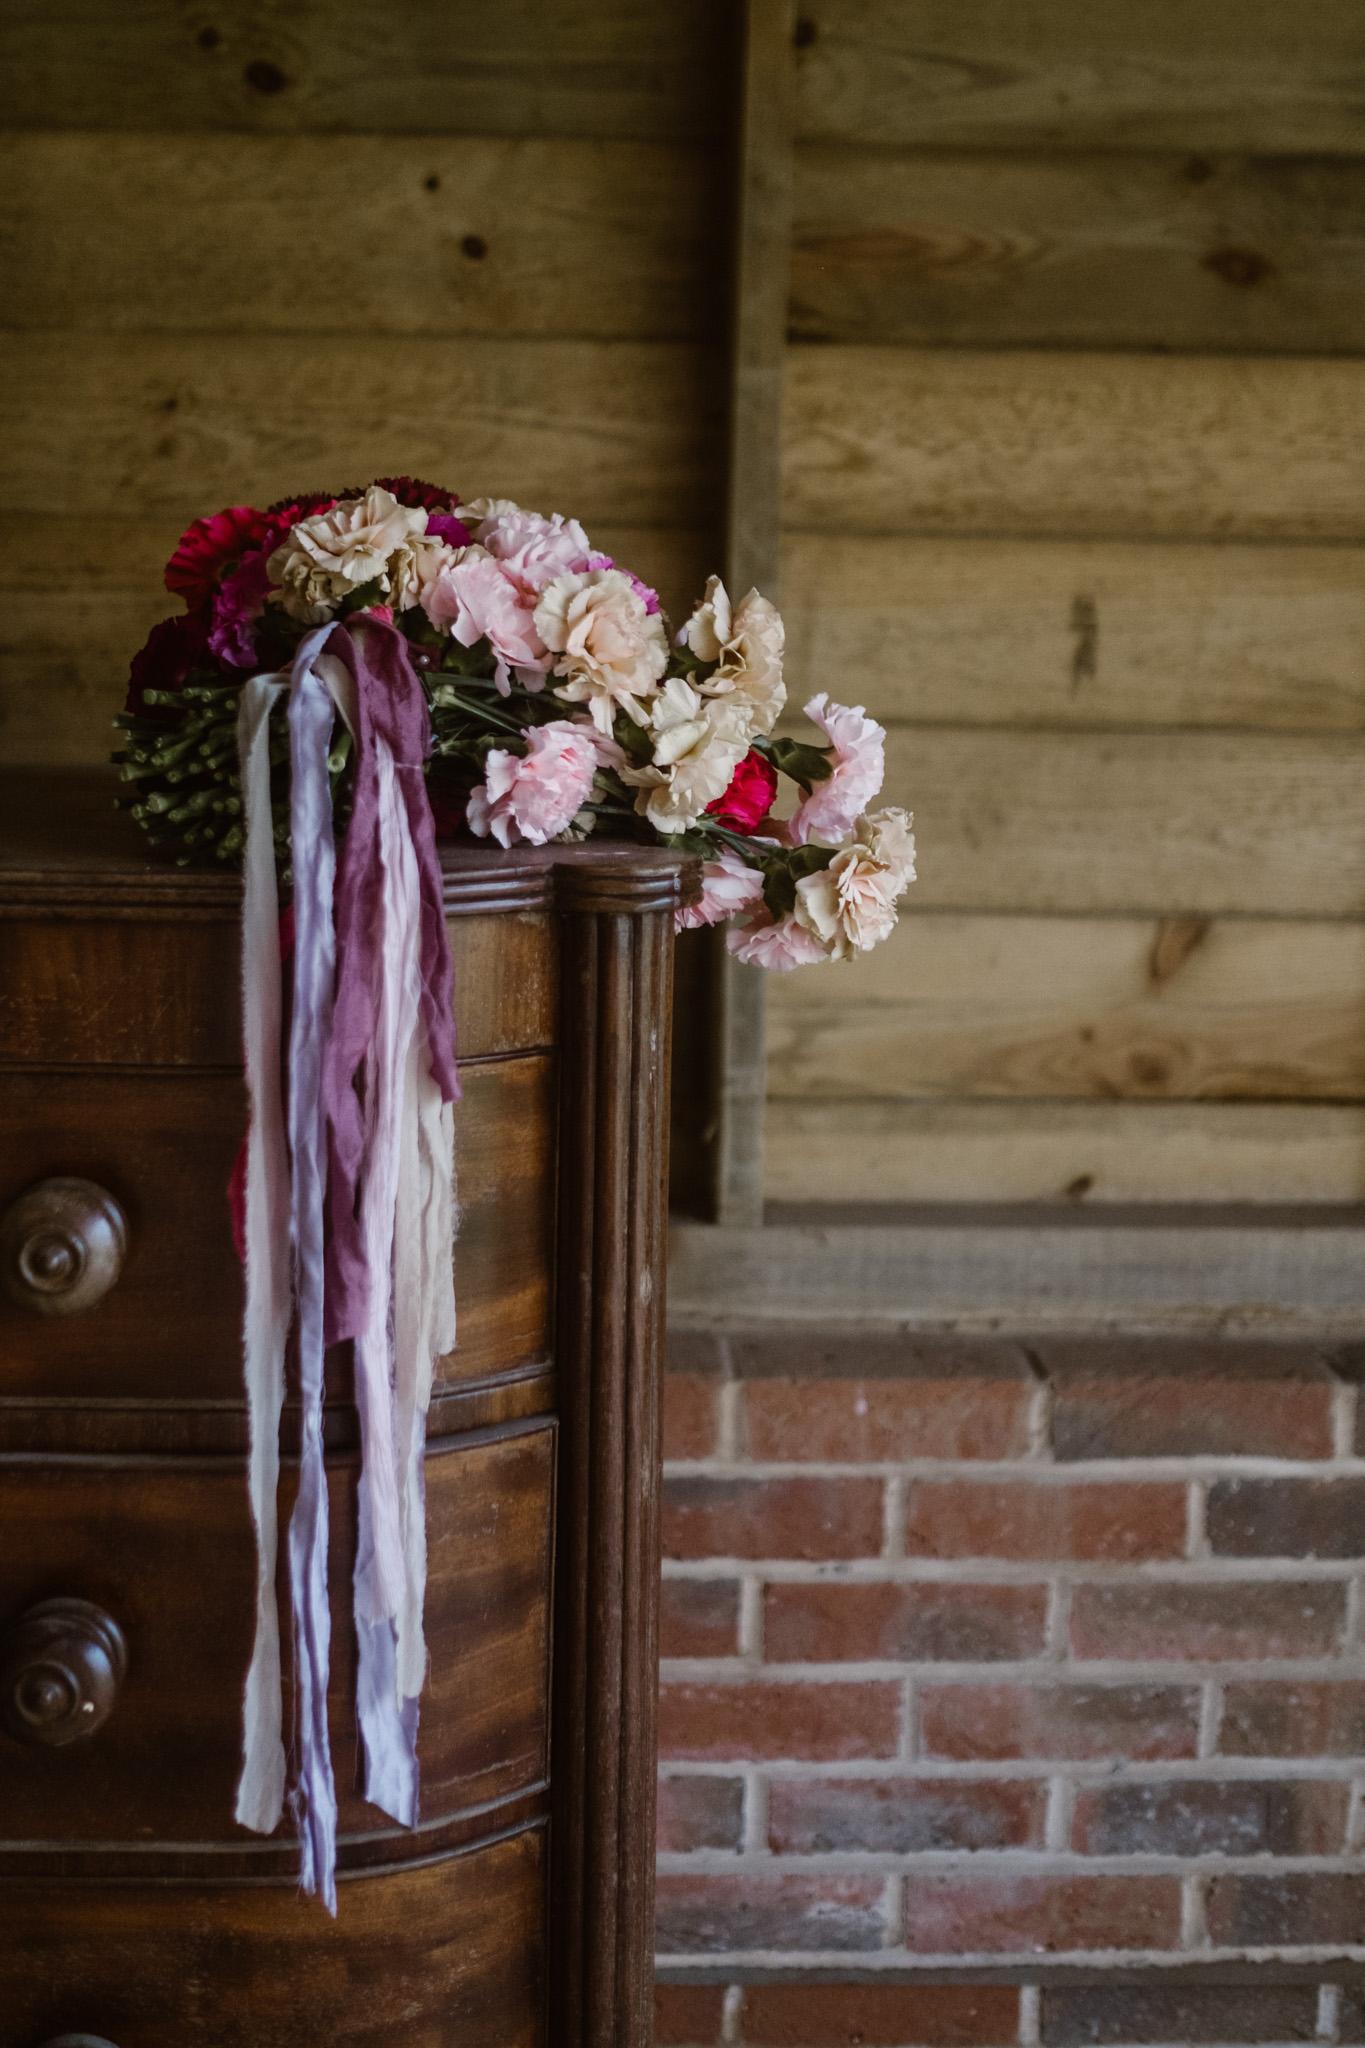 Captains-Wood-Barn-Alterative-Rustic-Vintage-Essex-Wedding-Suffolk-Grace-Elizabeth-51.jpg